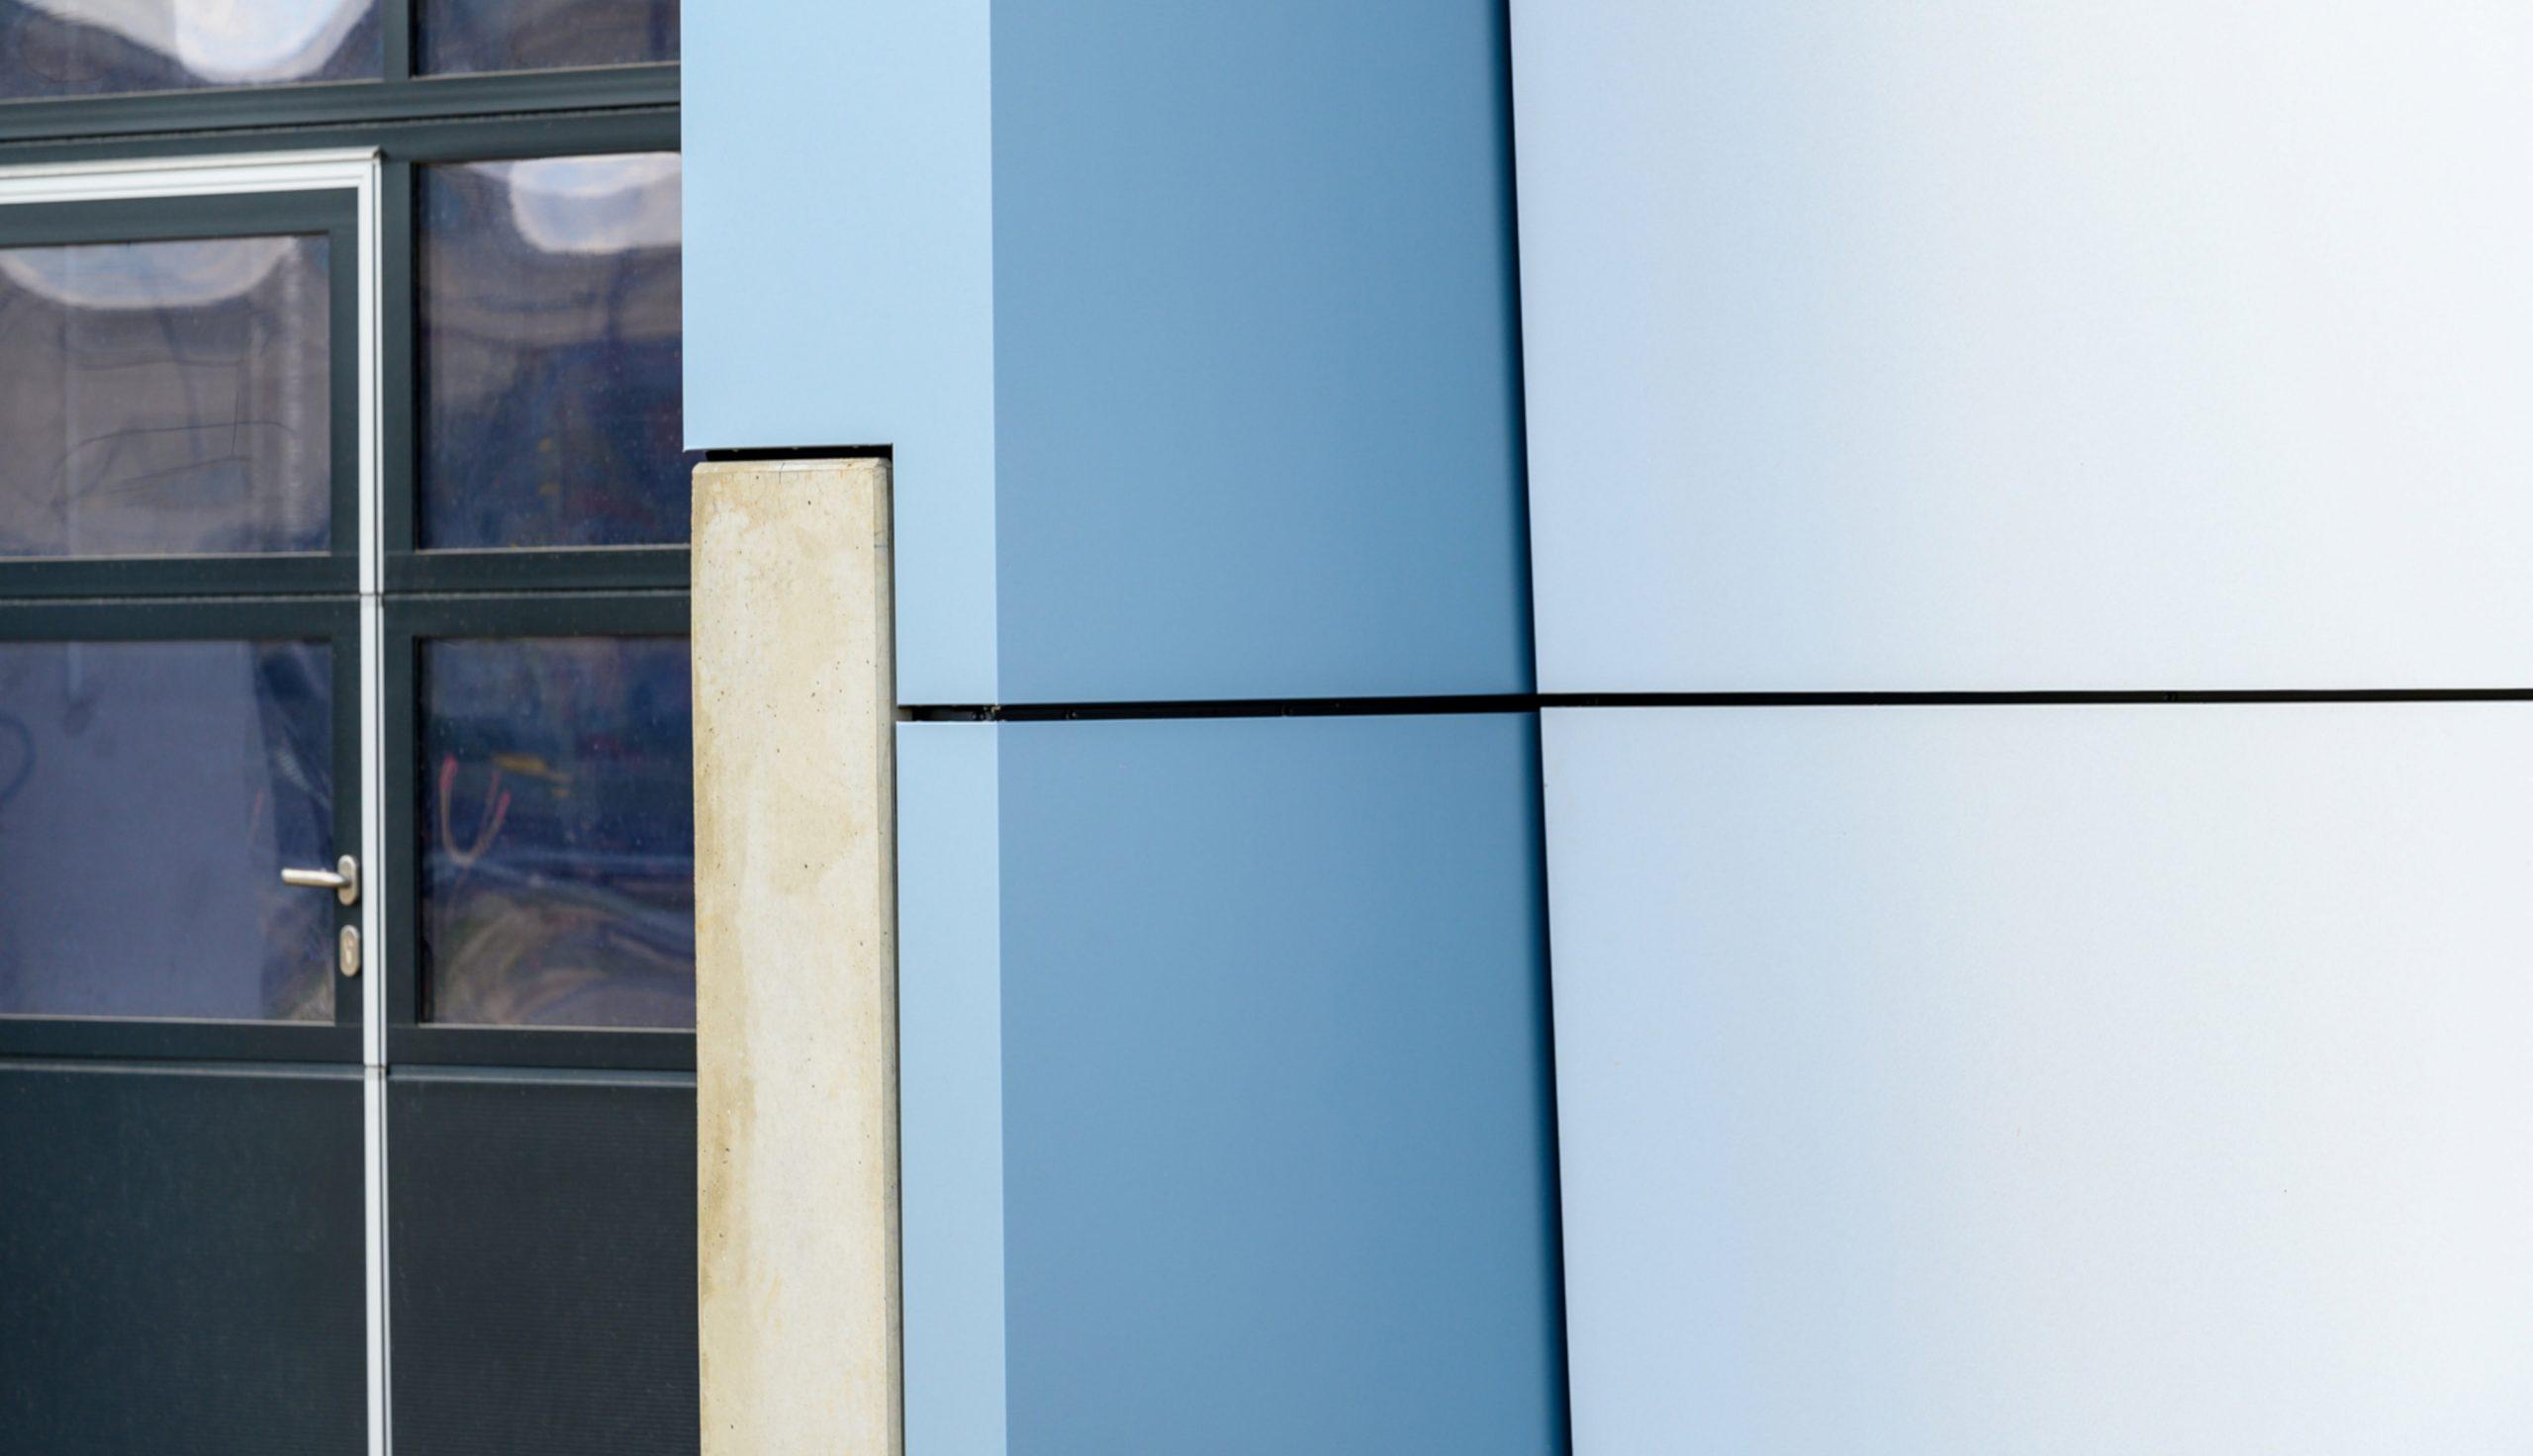 Projektbild 10, Kfz Instandsetzungshalle |  |  H.-J. Zieten Kaserne Beelitz